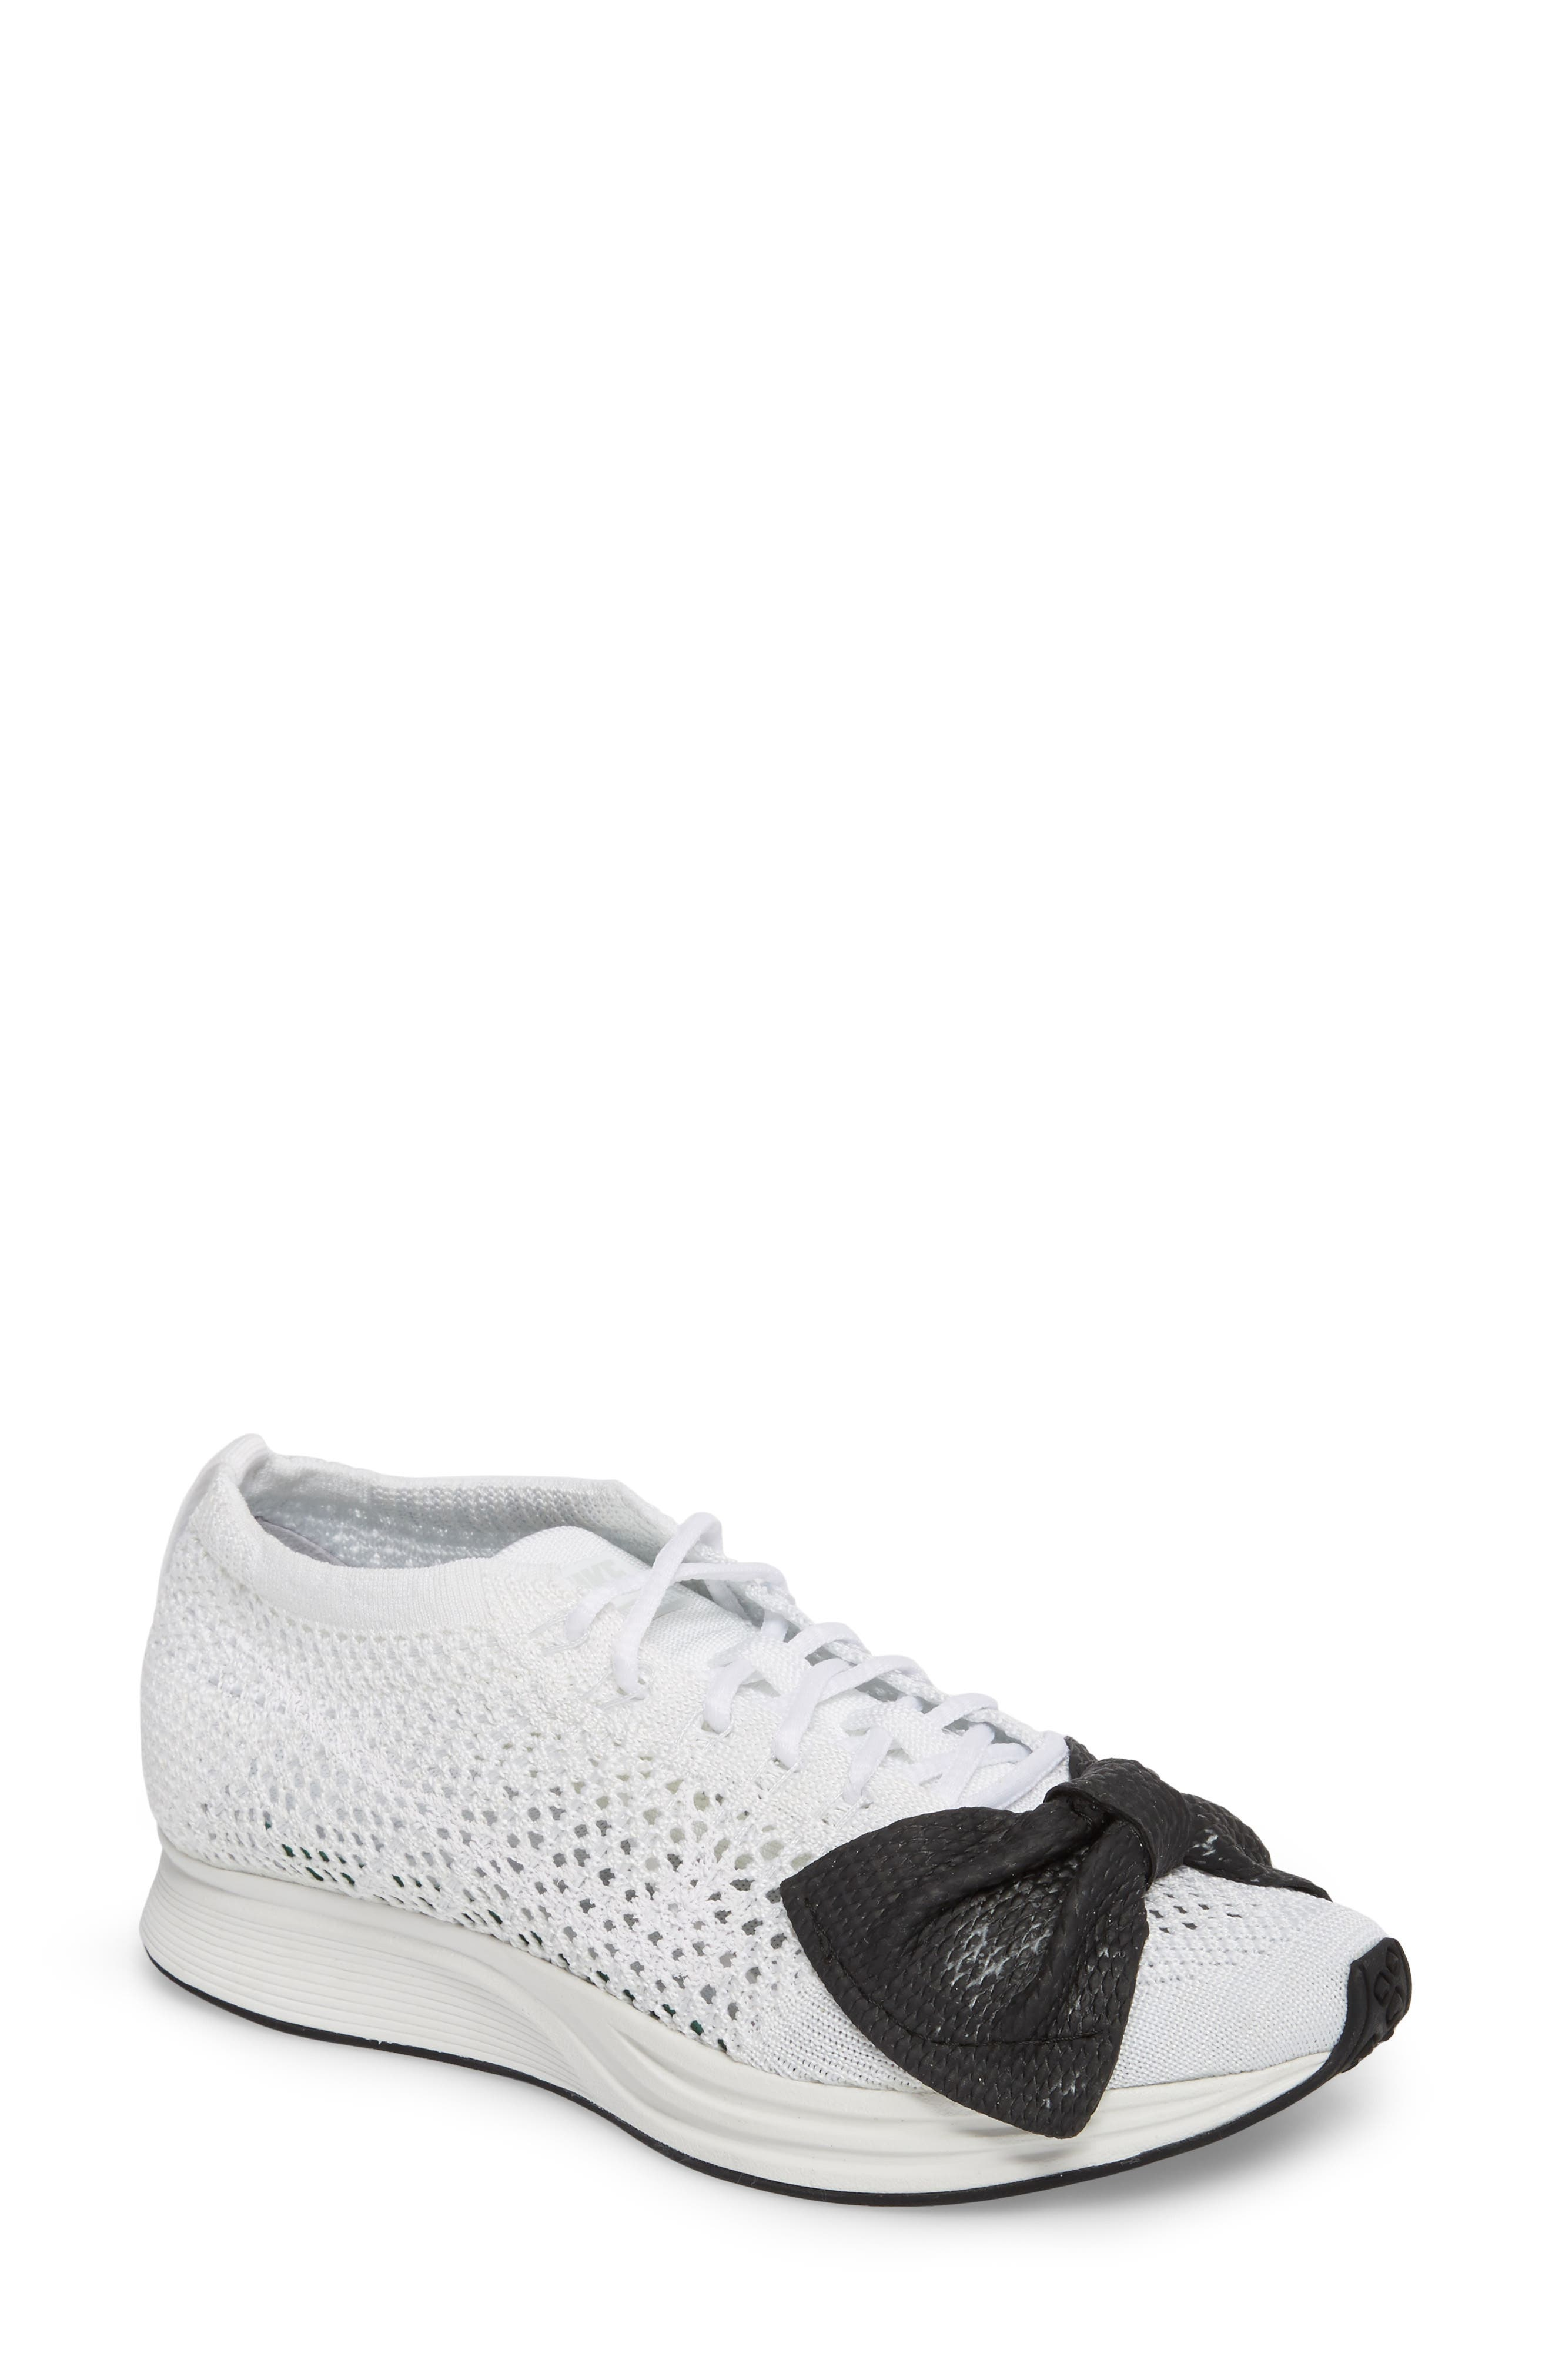 x Nike Bow Flyknit Racer Sneaker,                             Main thumbnail 1, color,                             White